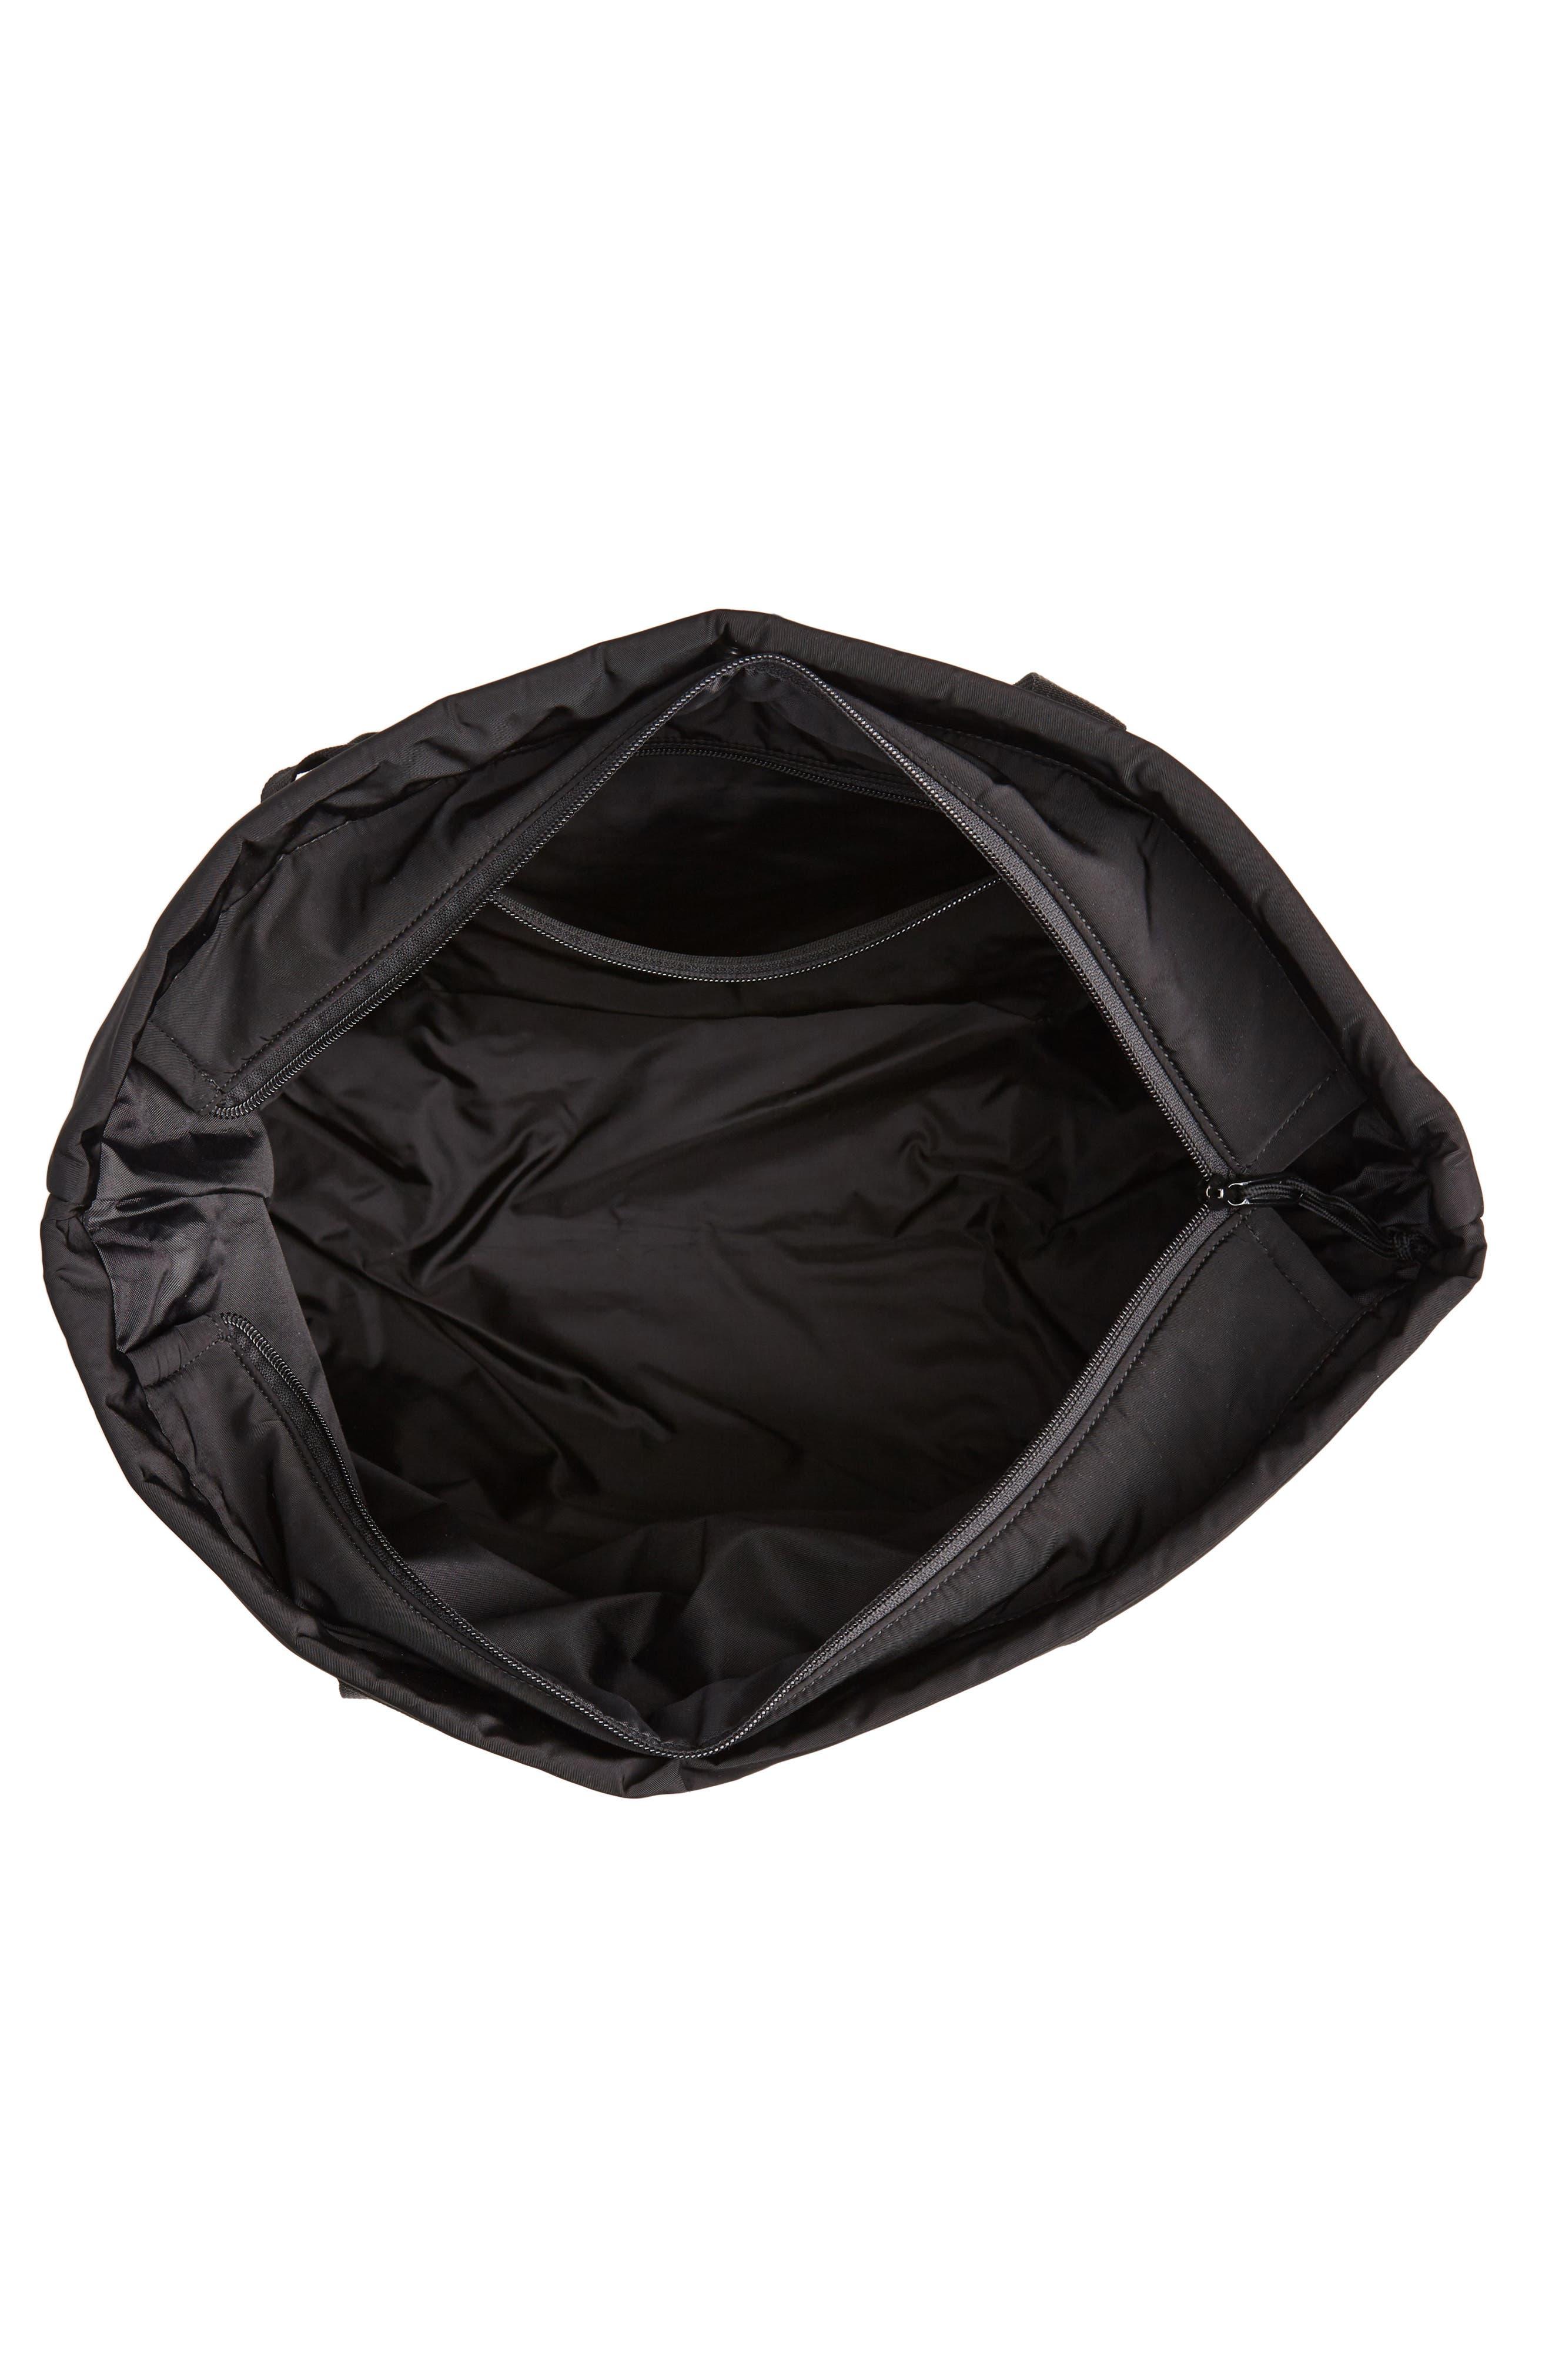 Military Shopper Tote Bag,                             Alternate thumbnail 4, color,                             001